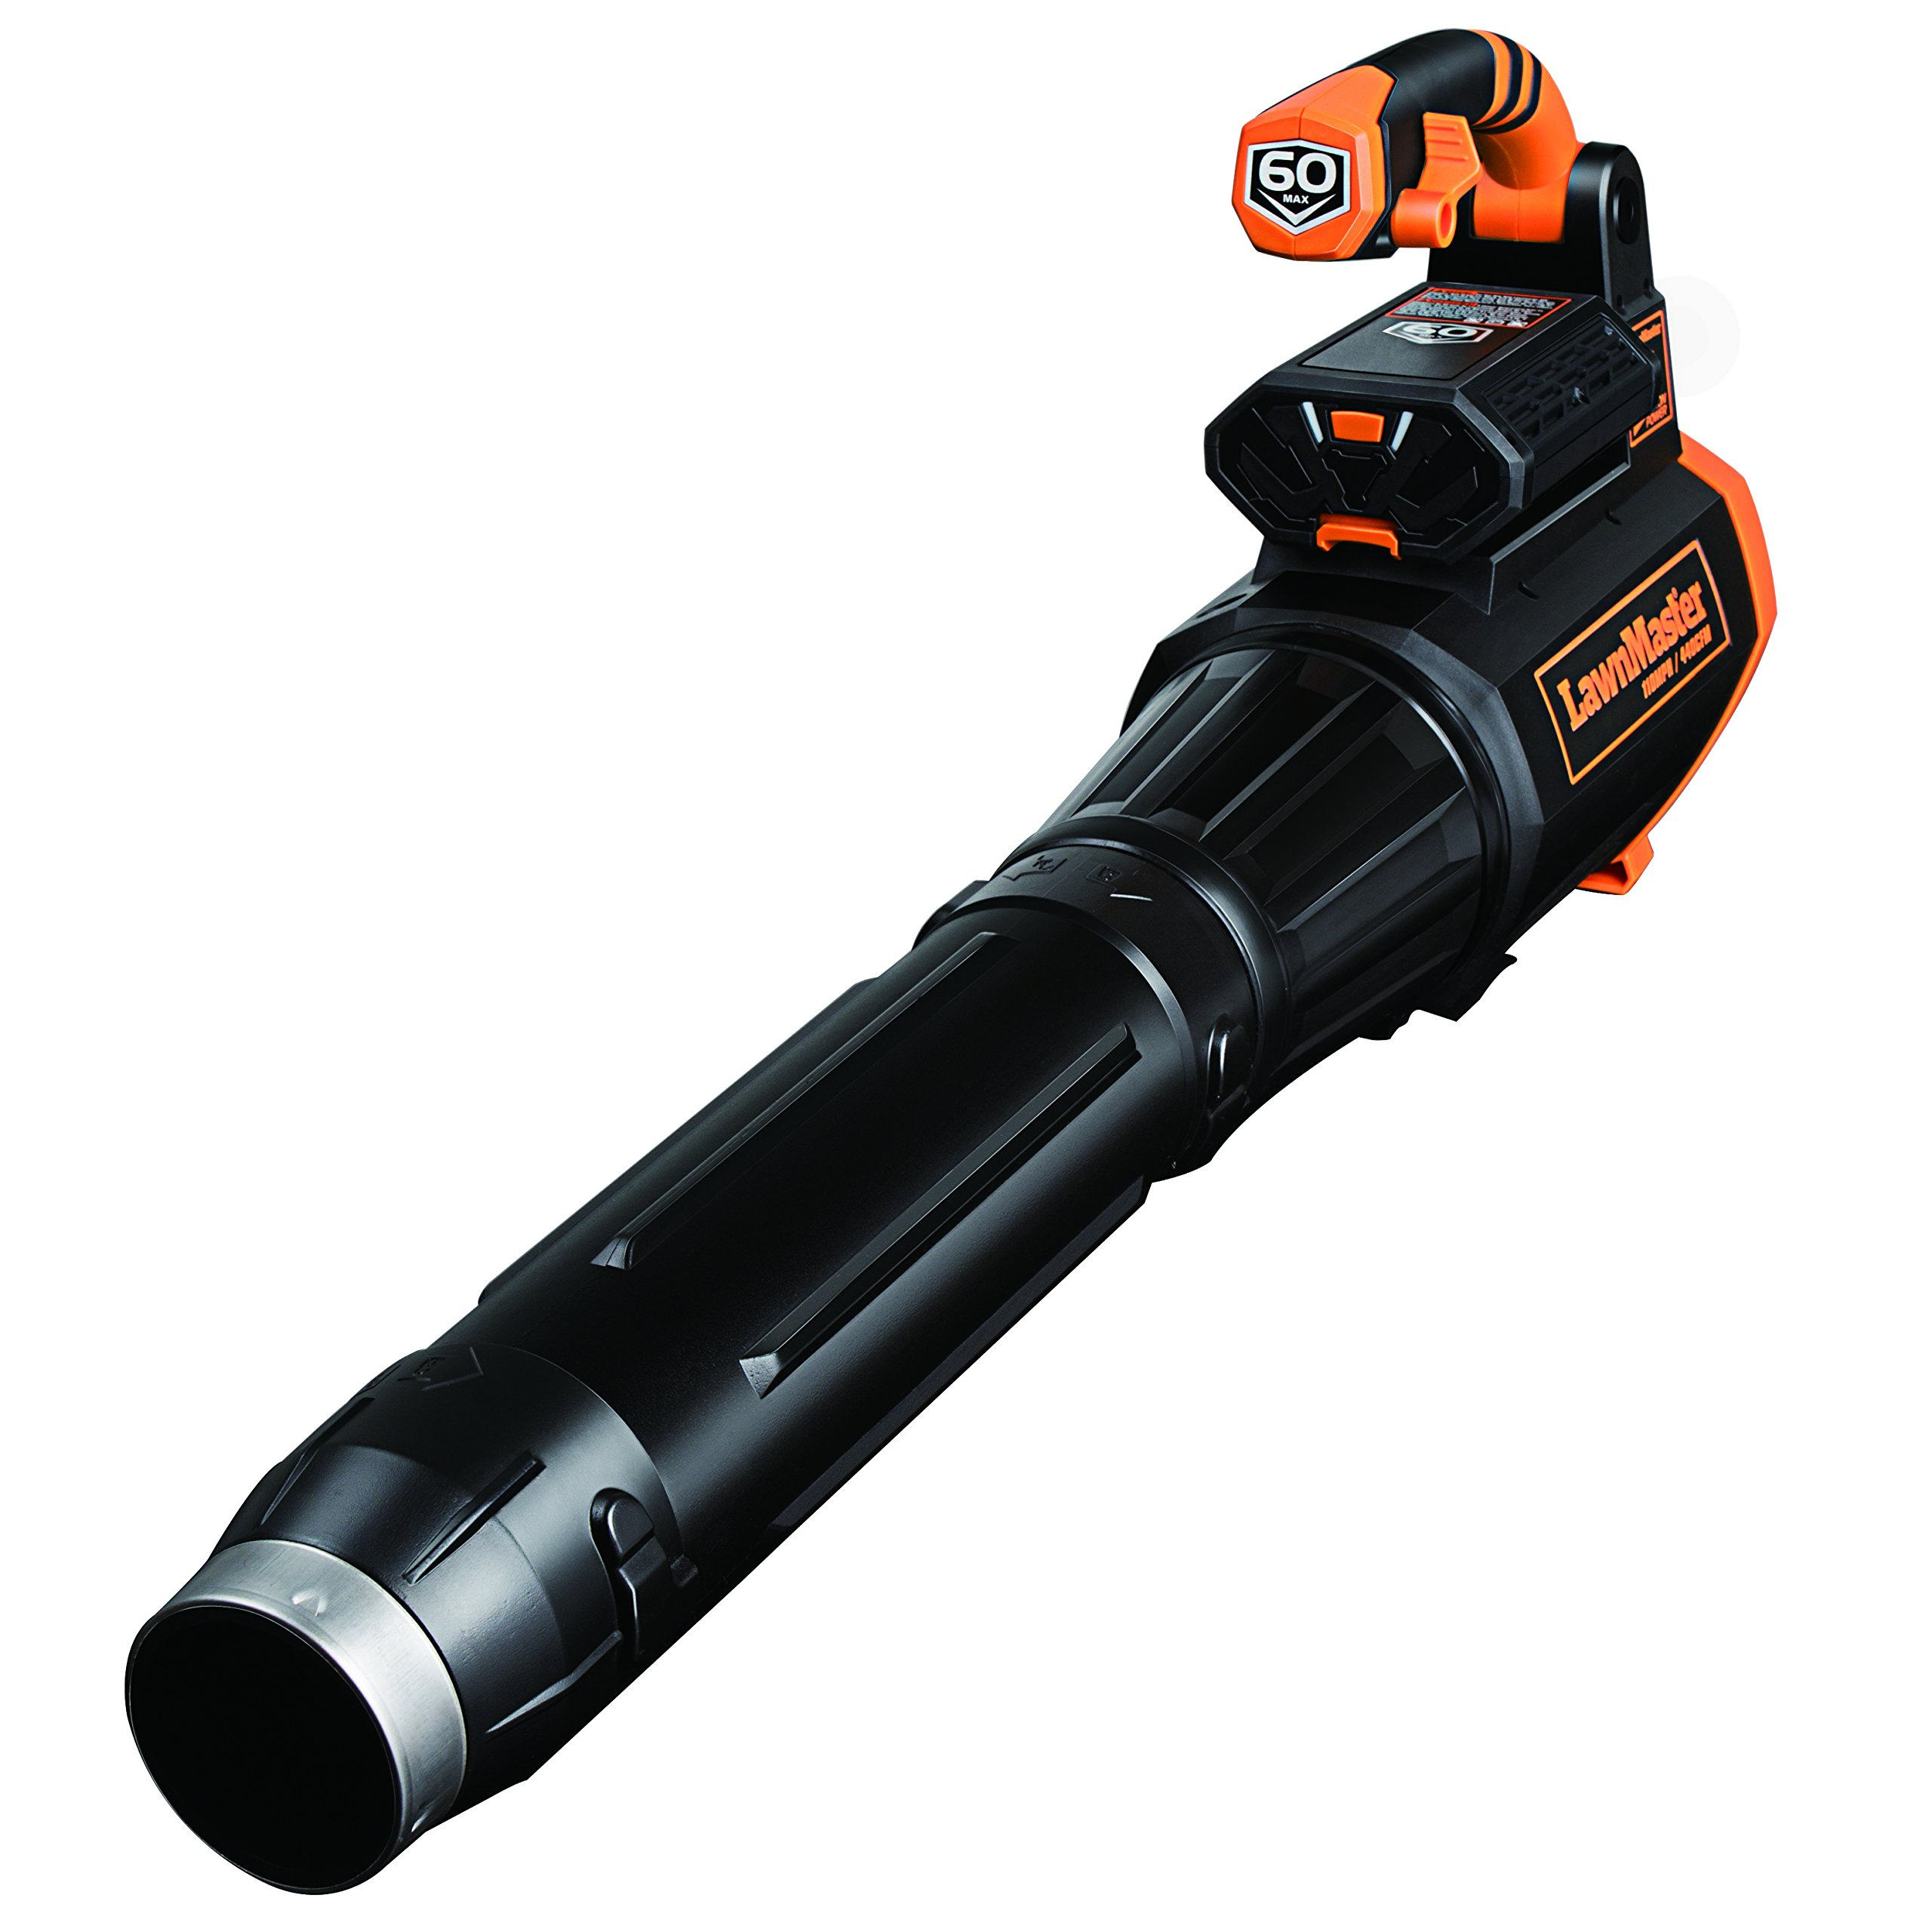 LawnMaster CLBL6015A 60V Blower Cordless